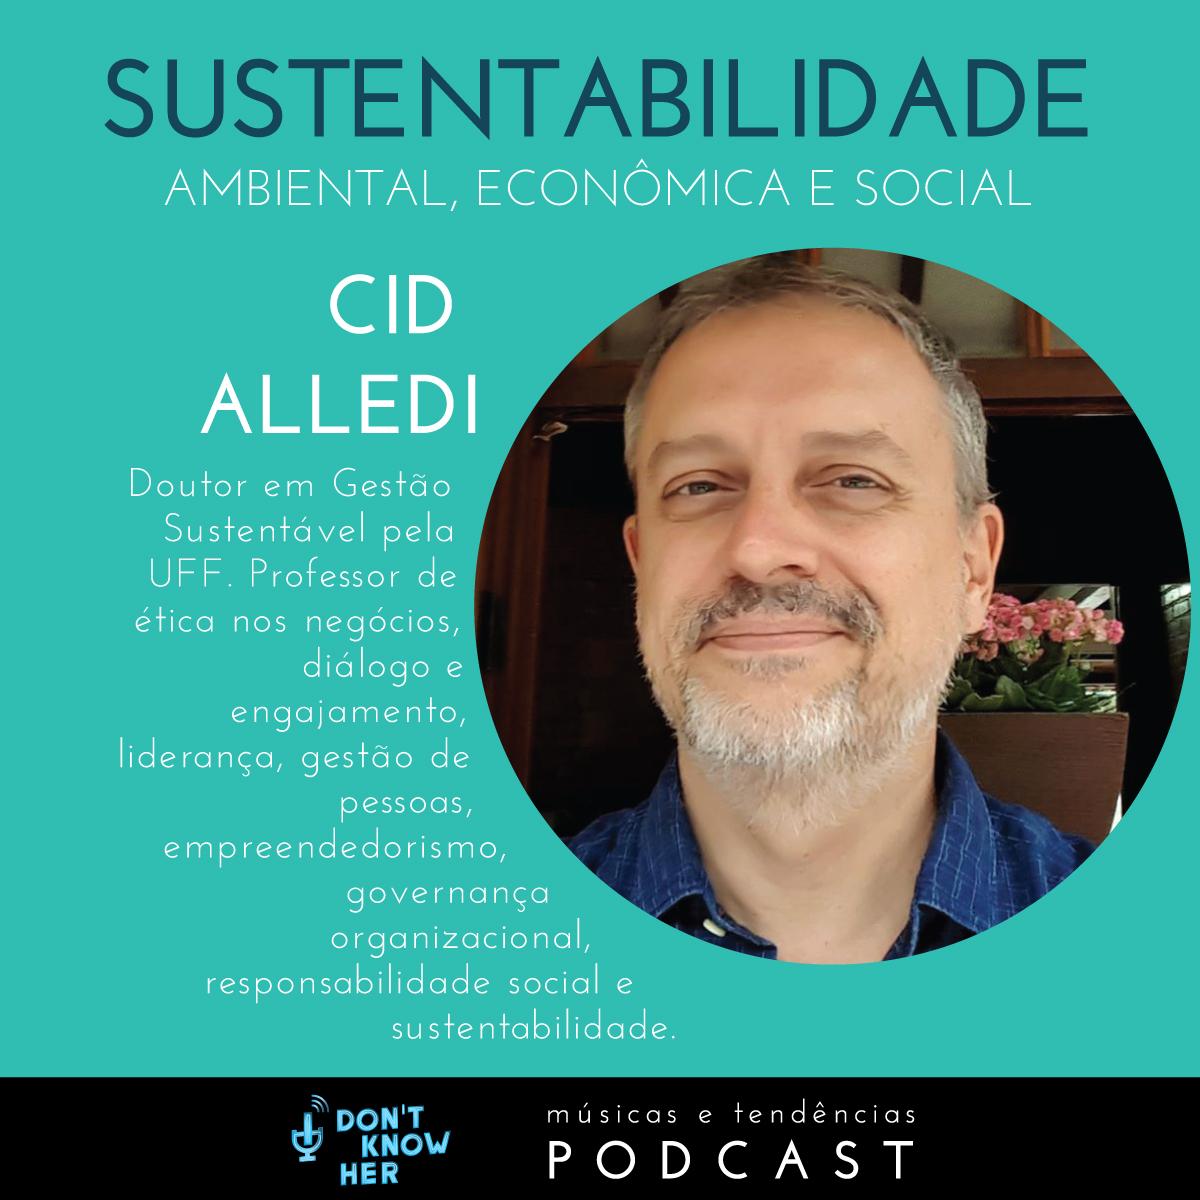 Vem ouvir! https://idkh.home.blog/  #sustentabilidade #socioambiental #maisamor #ameanatureza #salveanatureza #sustentabilidadecriativa #sustentabilidadebrasil #meioambiente #sustentável #podcastbrasil #podcastpt #podcastbr #podcastportugal #batepapo #podosferapic.twitter.com/Y4L0Uy4BVC